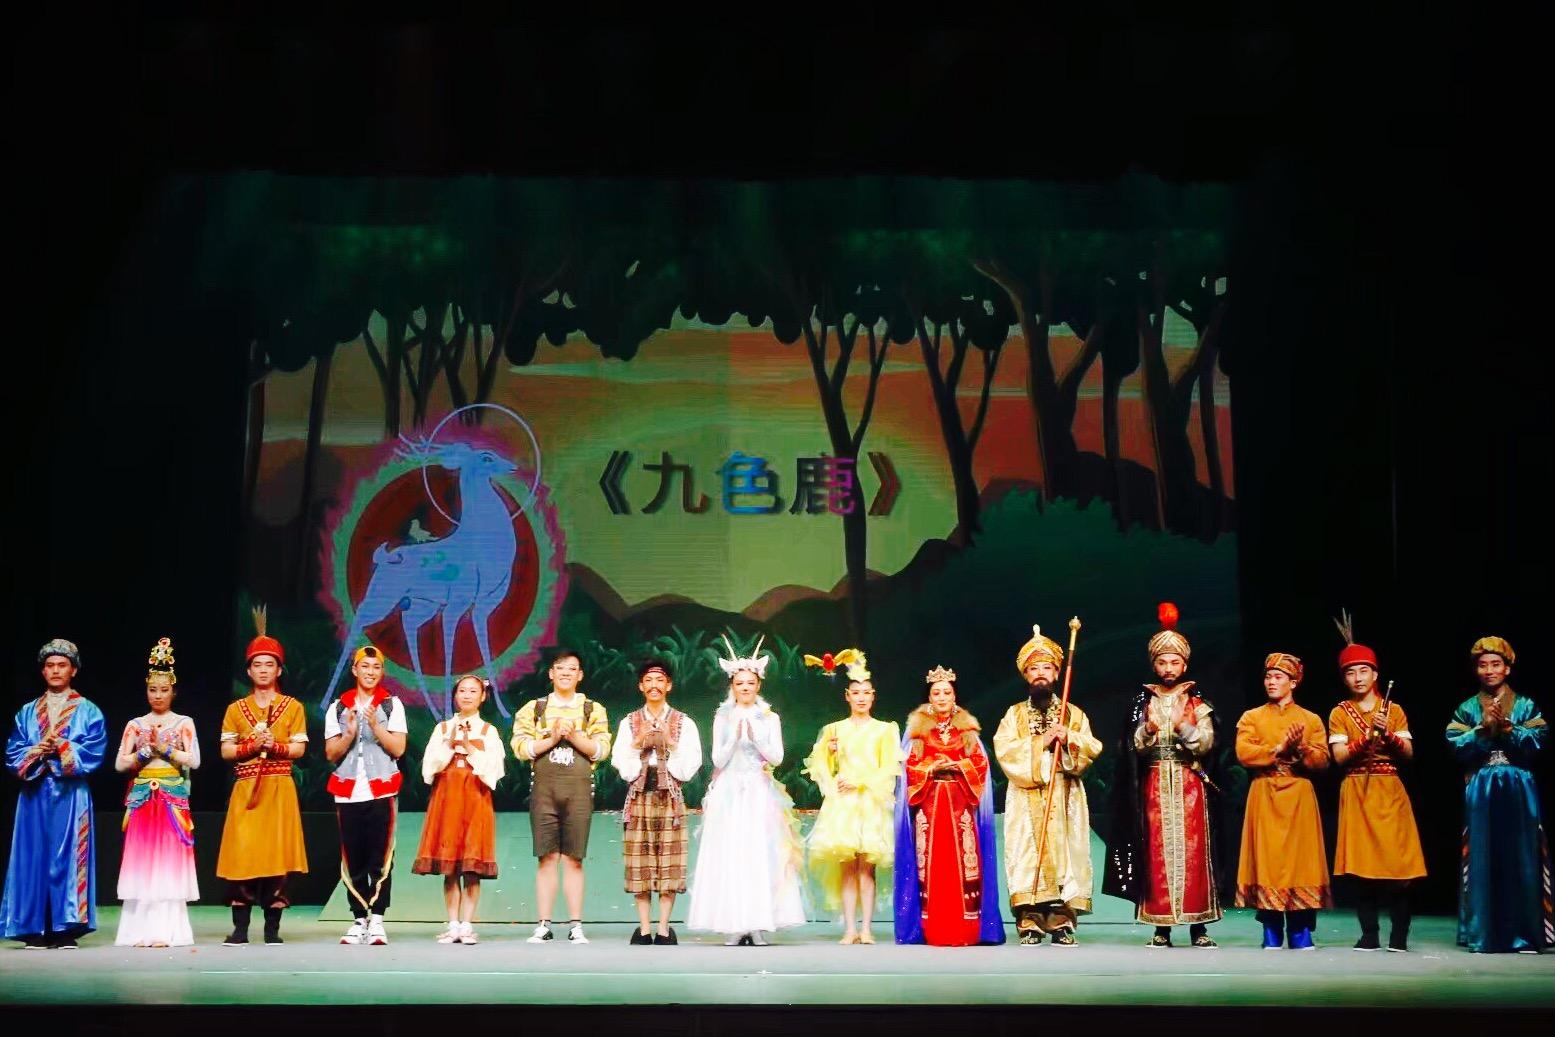 ballbet贝博网站首部原创儿童剧《九色鹿》全国巡演完美收官!